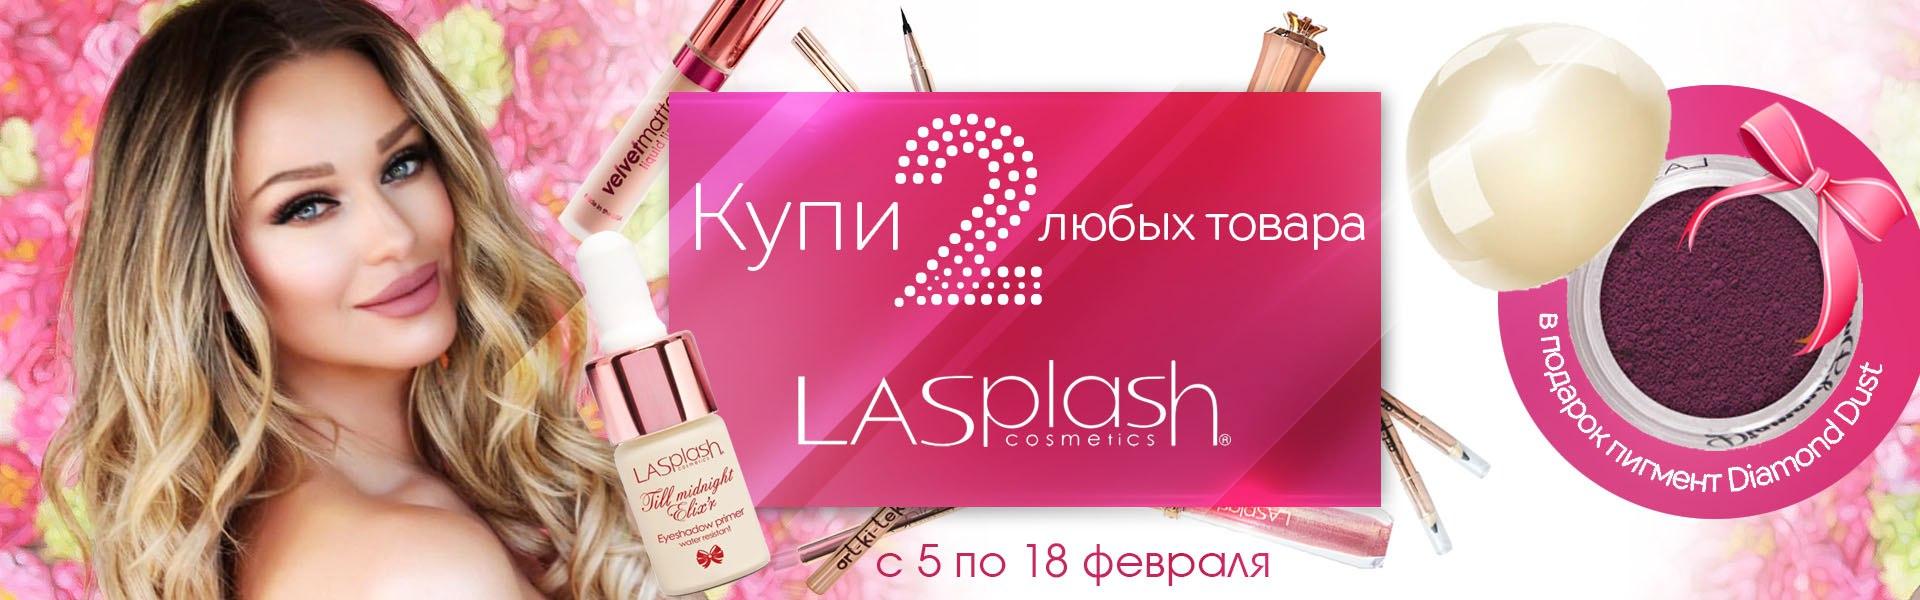 Акция LASplash